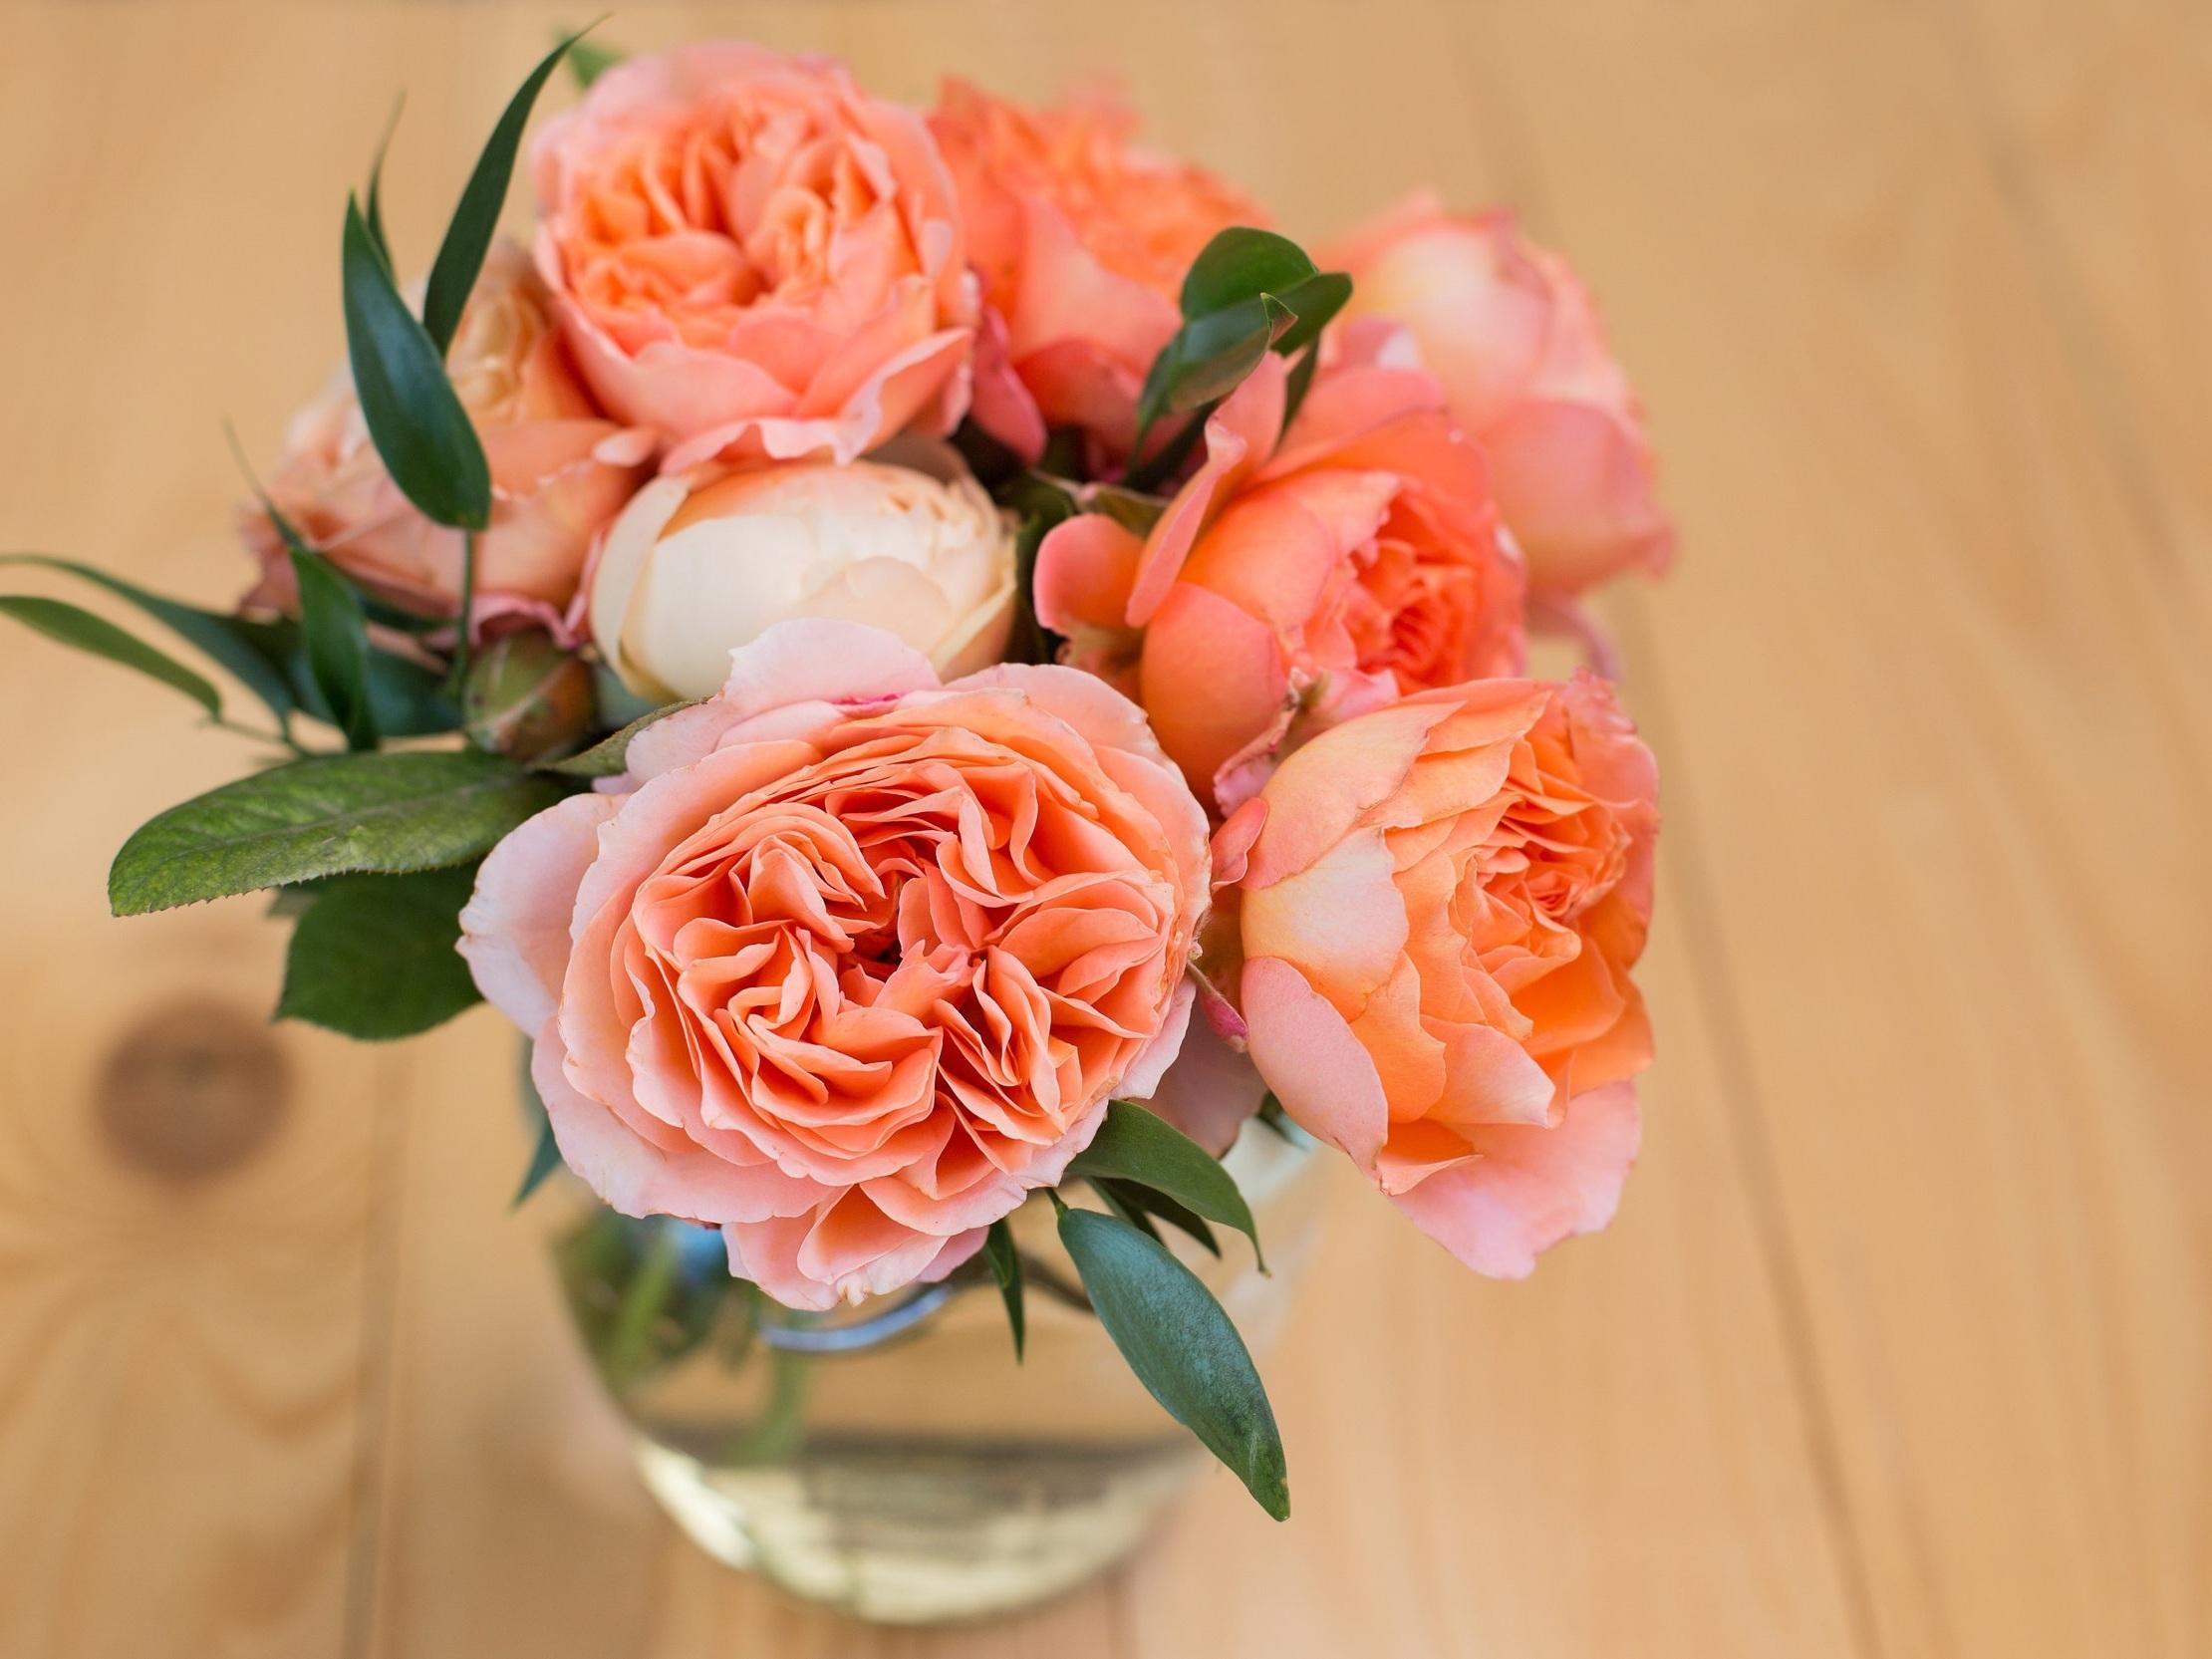 New Season Roses